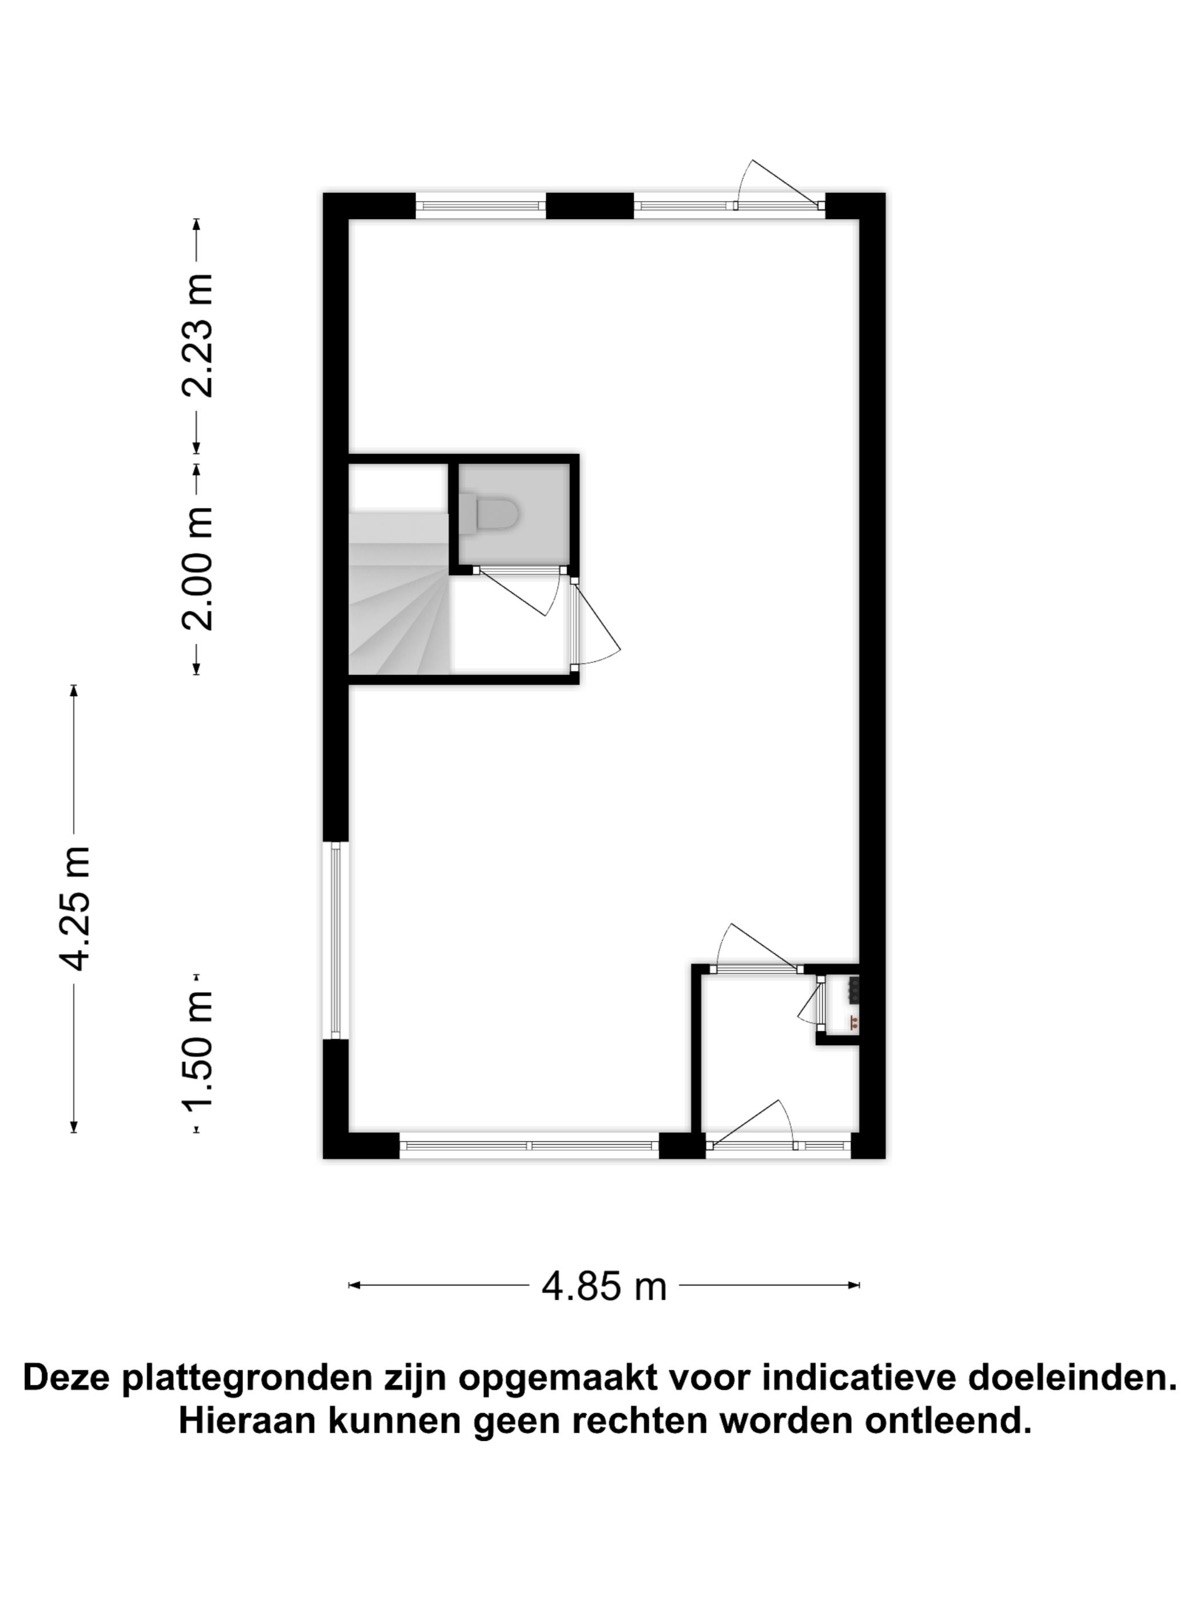 sudergoweg-38-ijlst-plattegrond-8